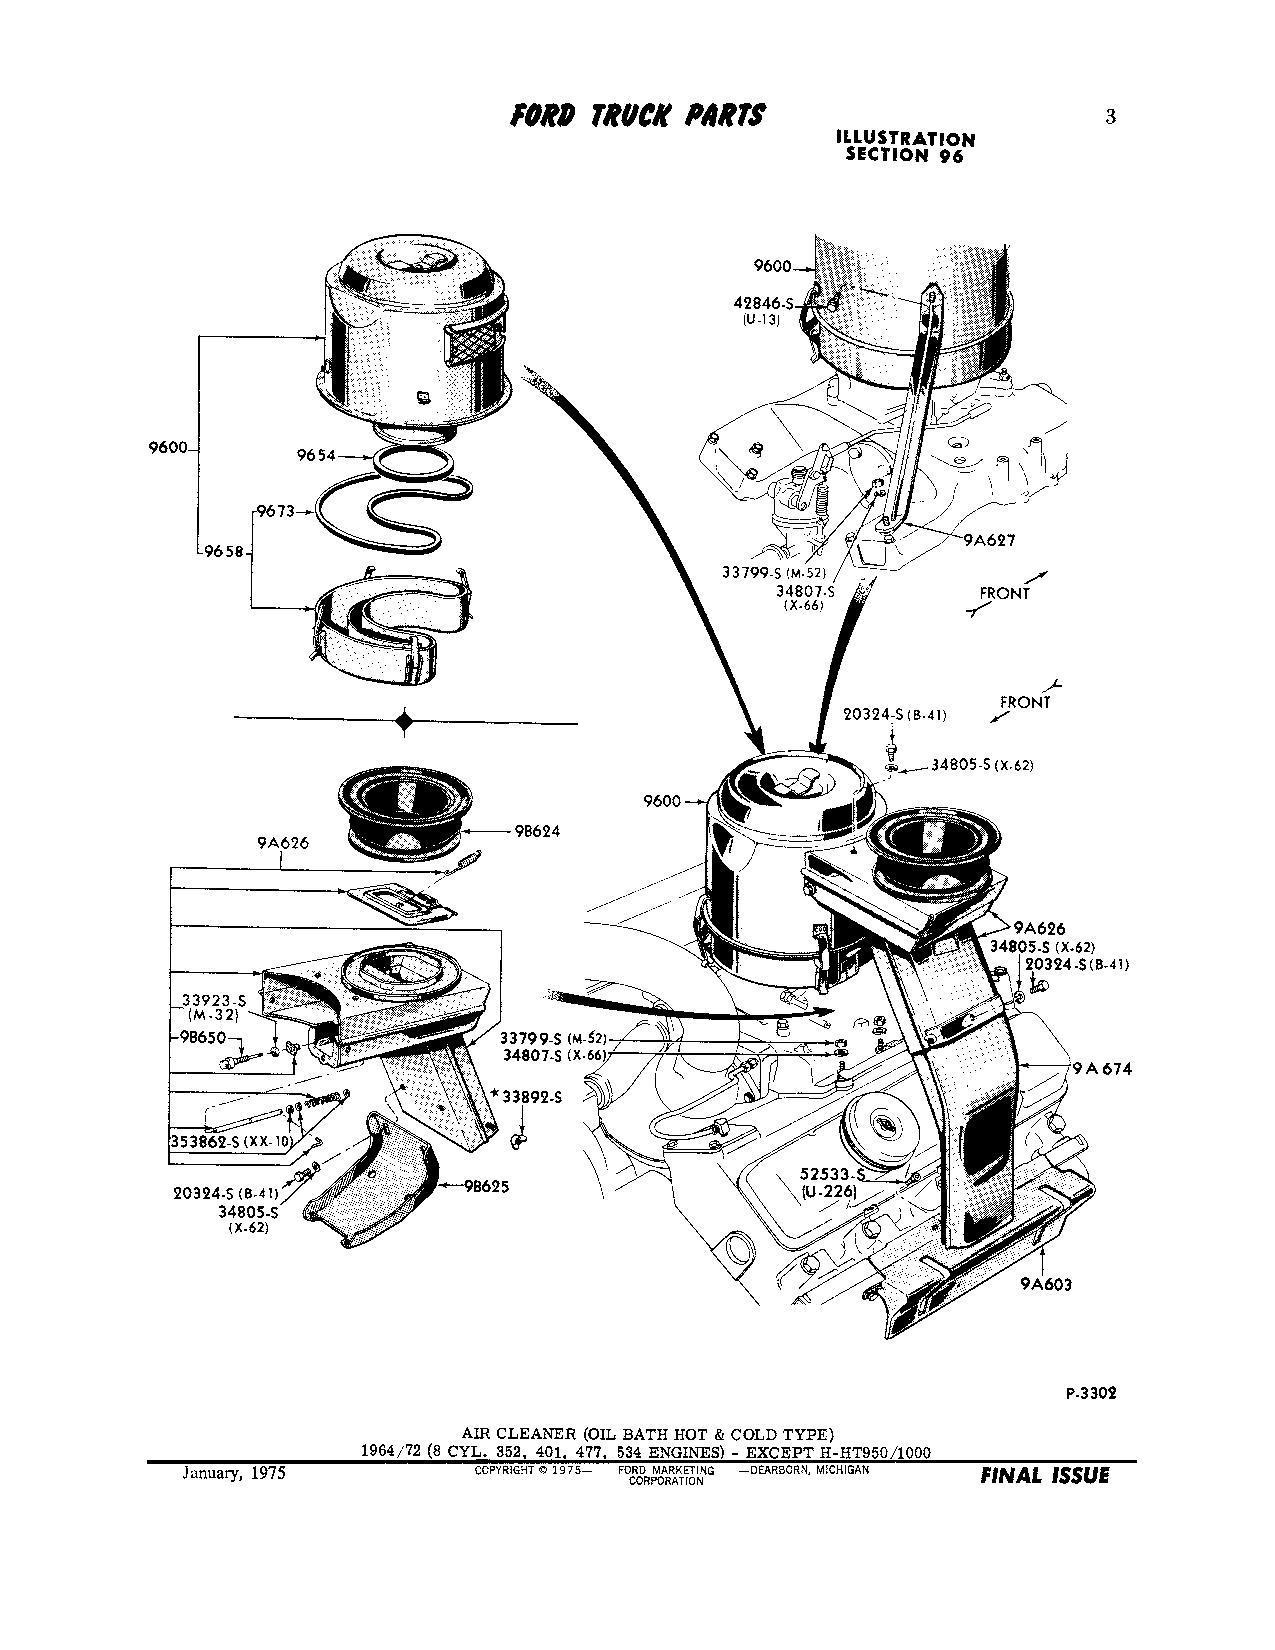 F850 534 V8 Info Where To Get Parts